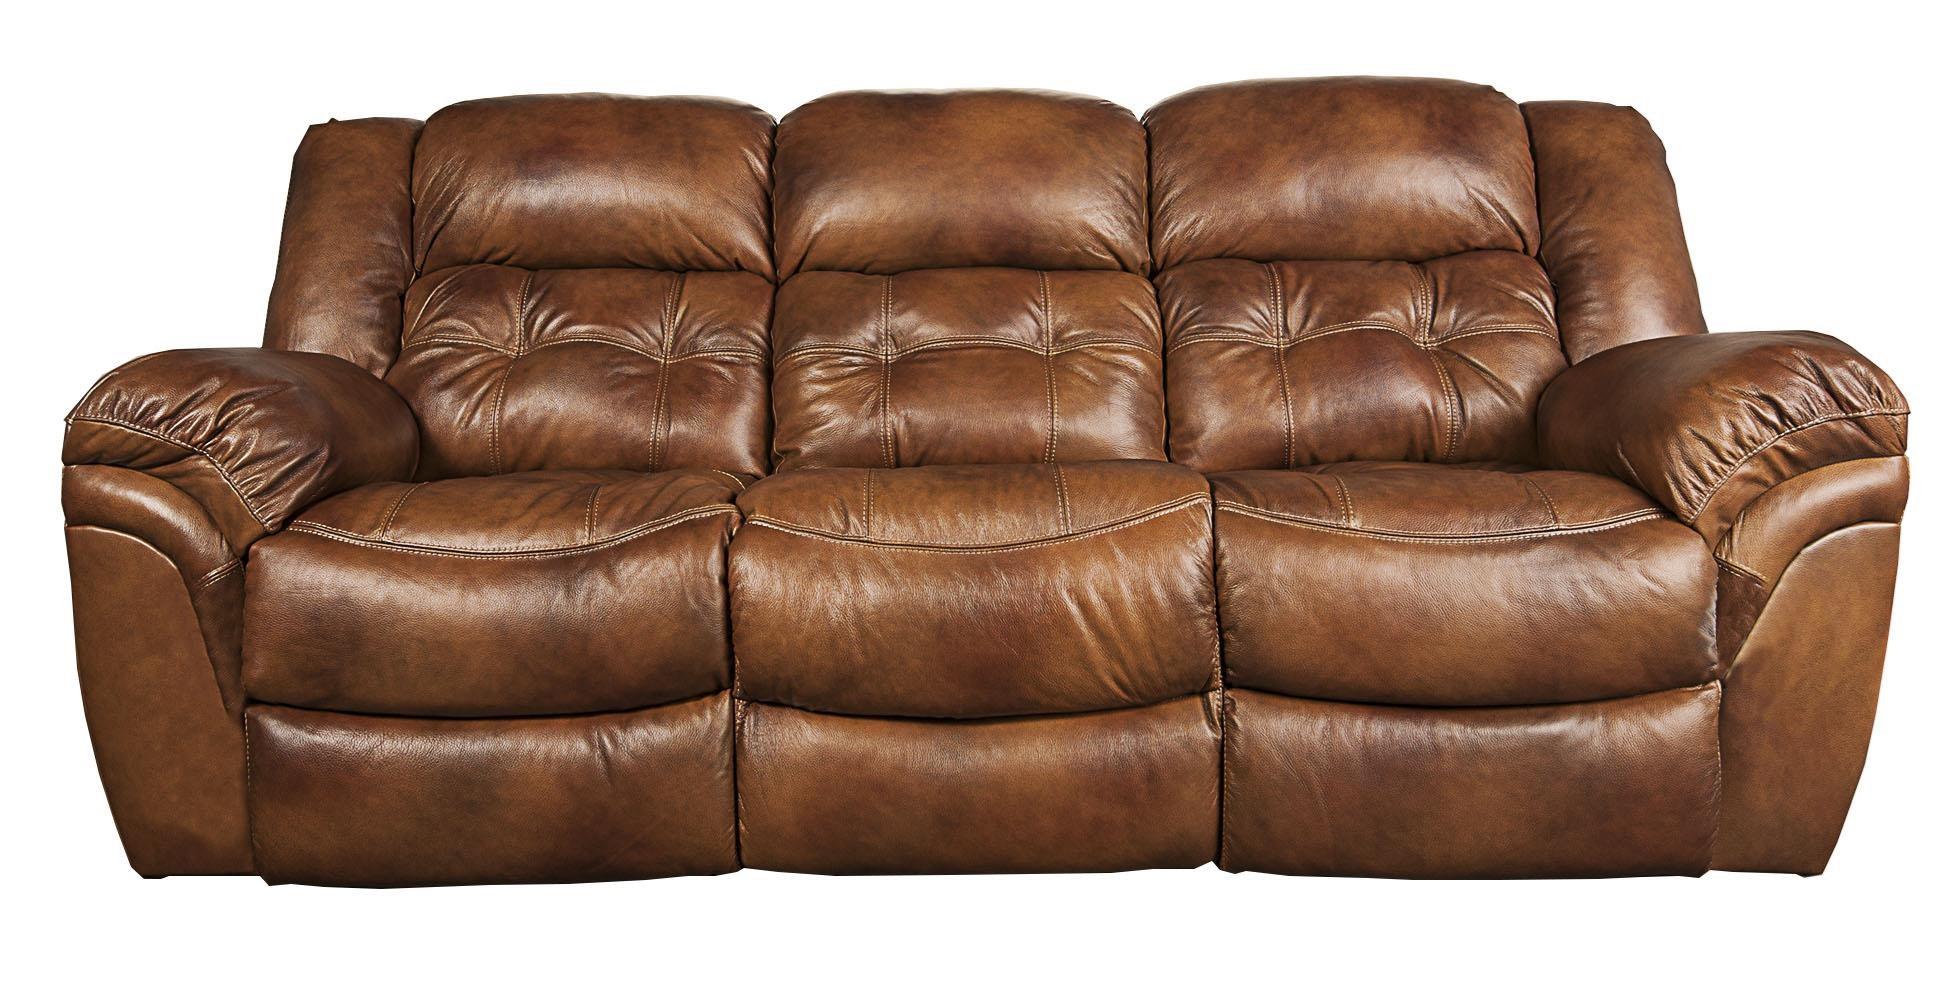 squashy sofas uk sleeper atlanta plush dimarlinperez